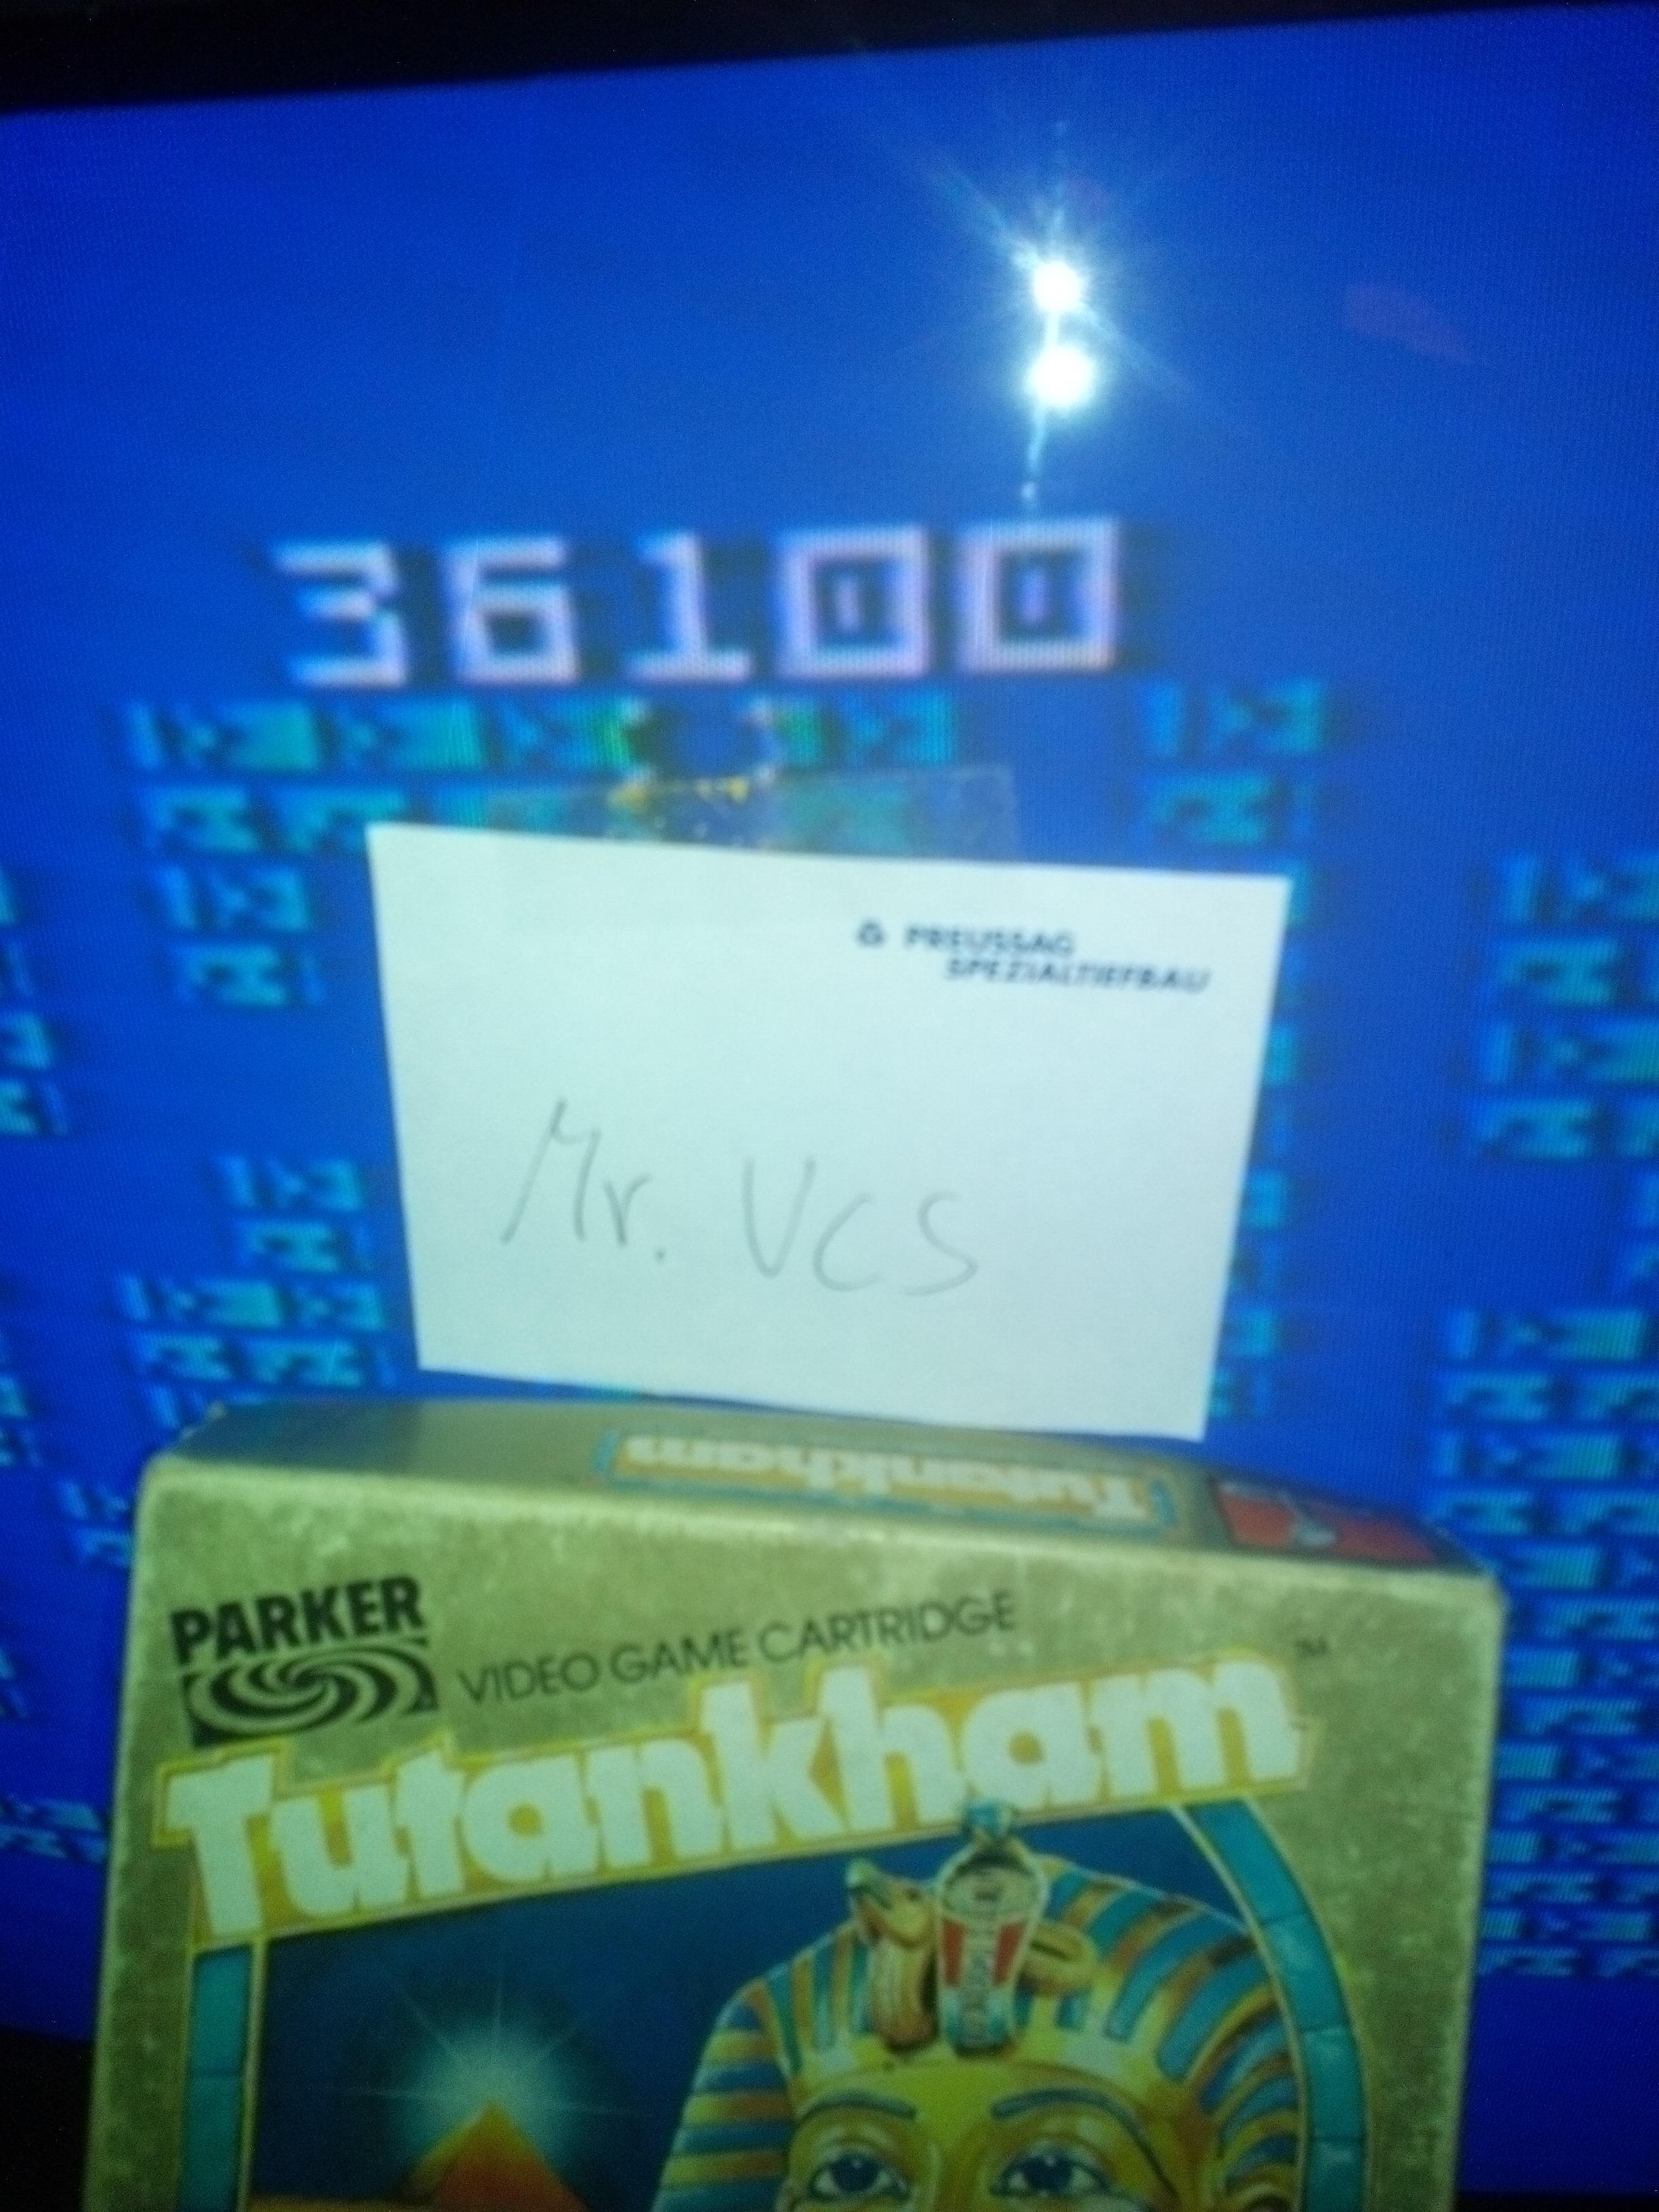 MisterVCS: Tutankham: Level 1 (Intellivision) 36,100 points on 2017-12-02 11:59:11